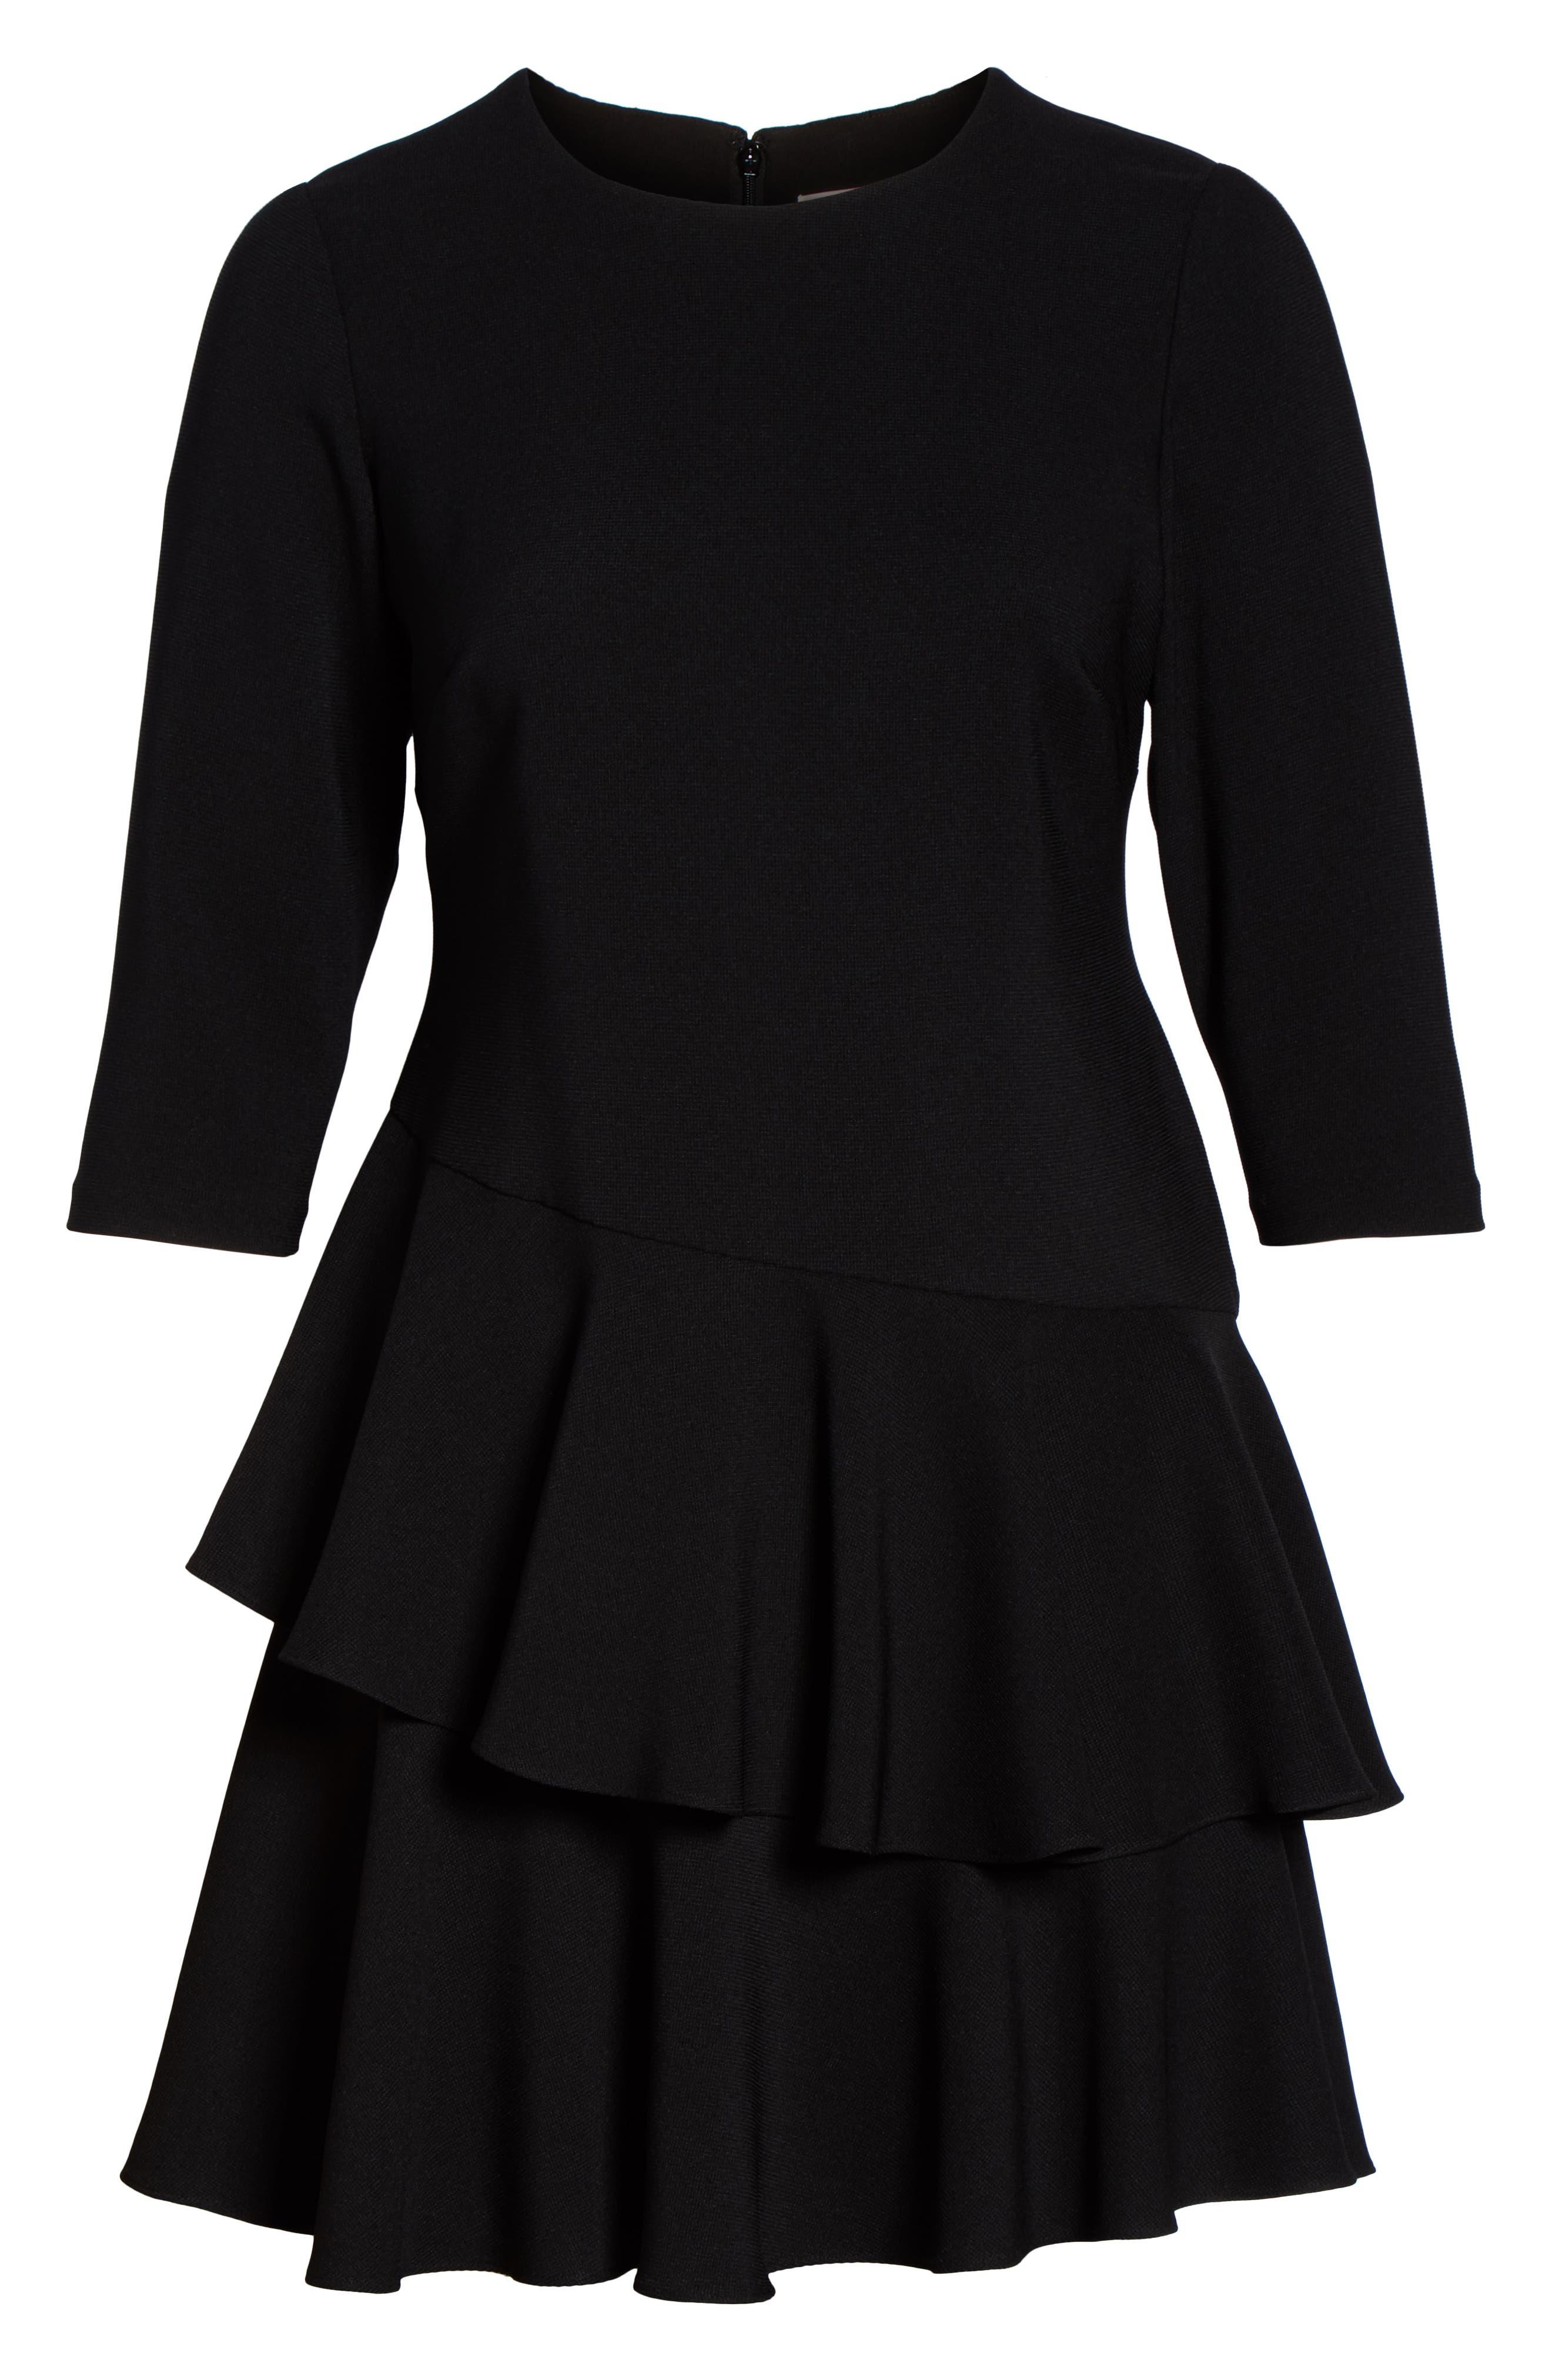 Ruffle Tiered Shift Dress,                             Alternate thumbnail 7, color,                             BLACK